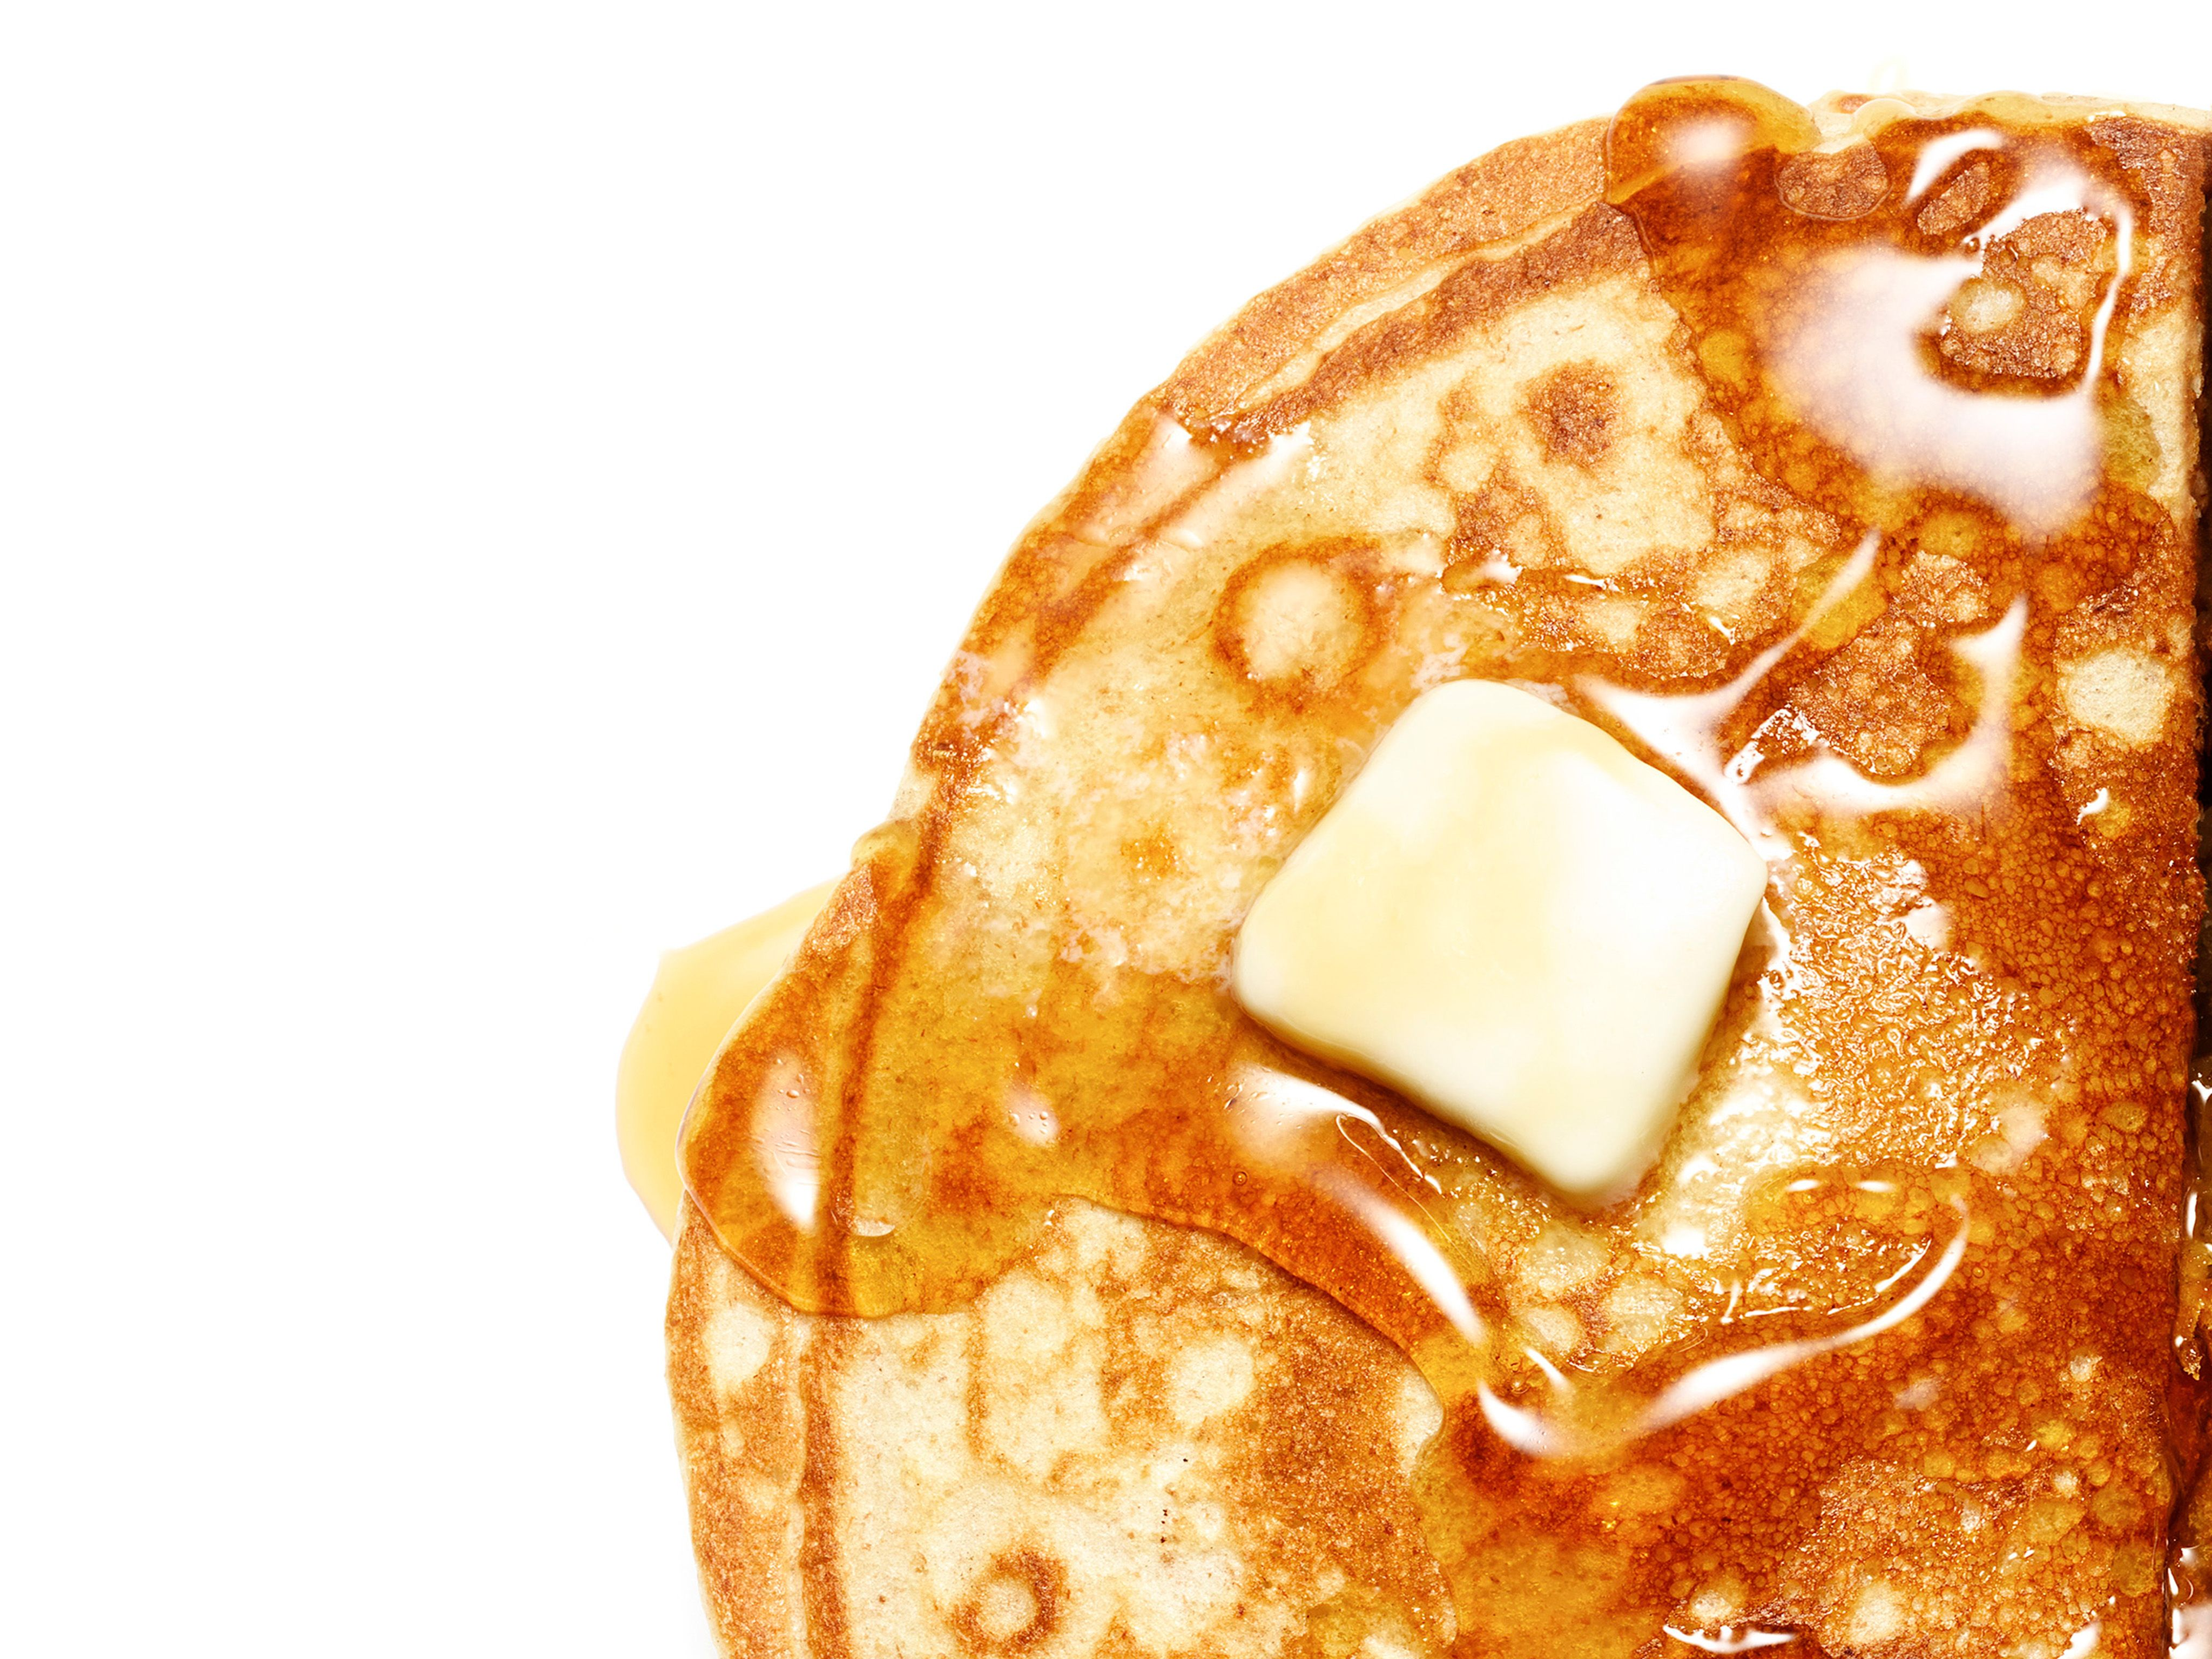 Buttermilk Pancakes Recipe Food Network Recipes Food Network Pancakes Pancake Recipe Buttermilk